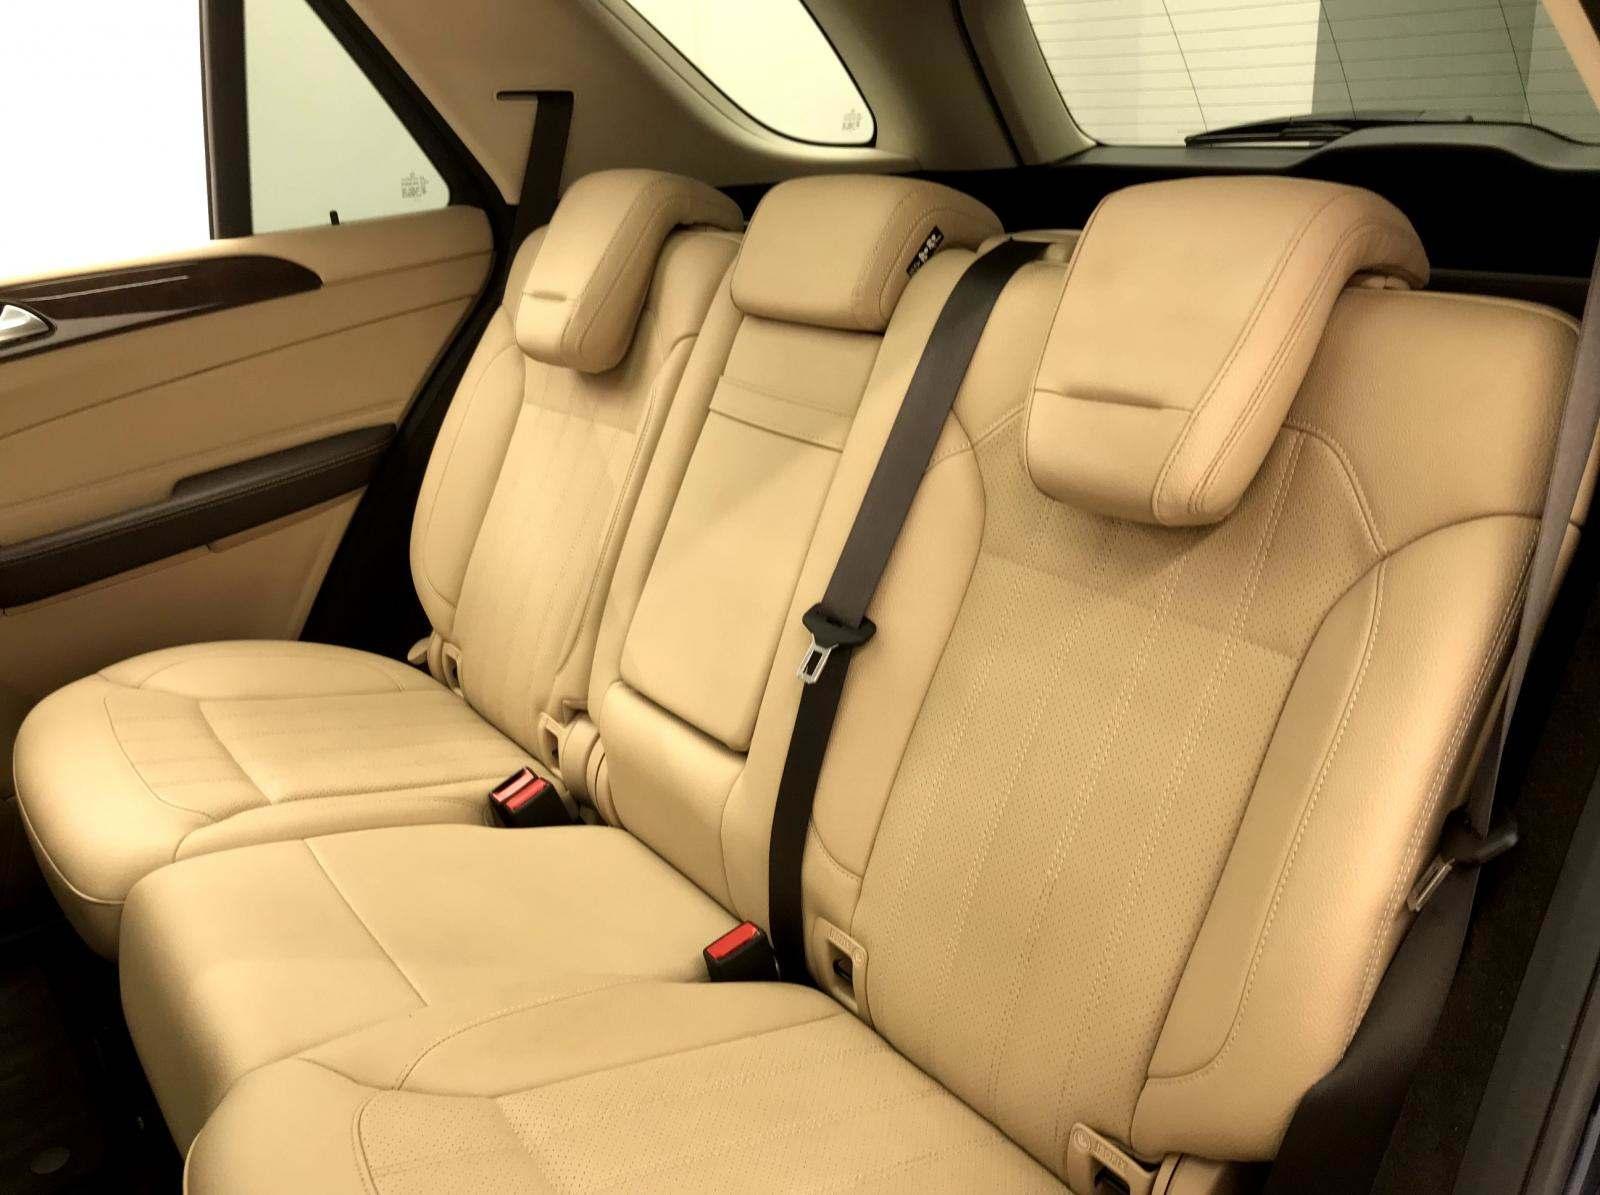 used Mercedes-Benz GLE-Class 2016 vin: 4JGDA5HB4GA784247